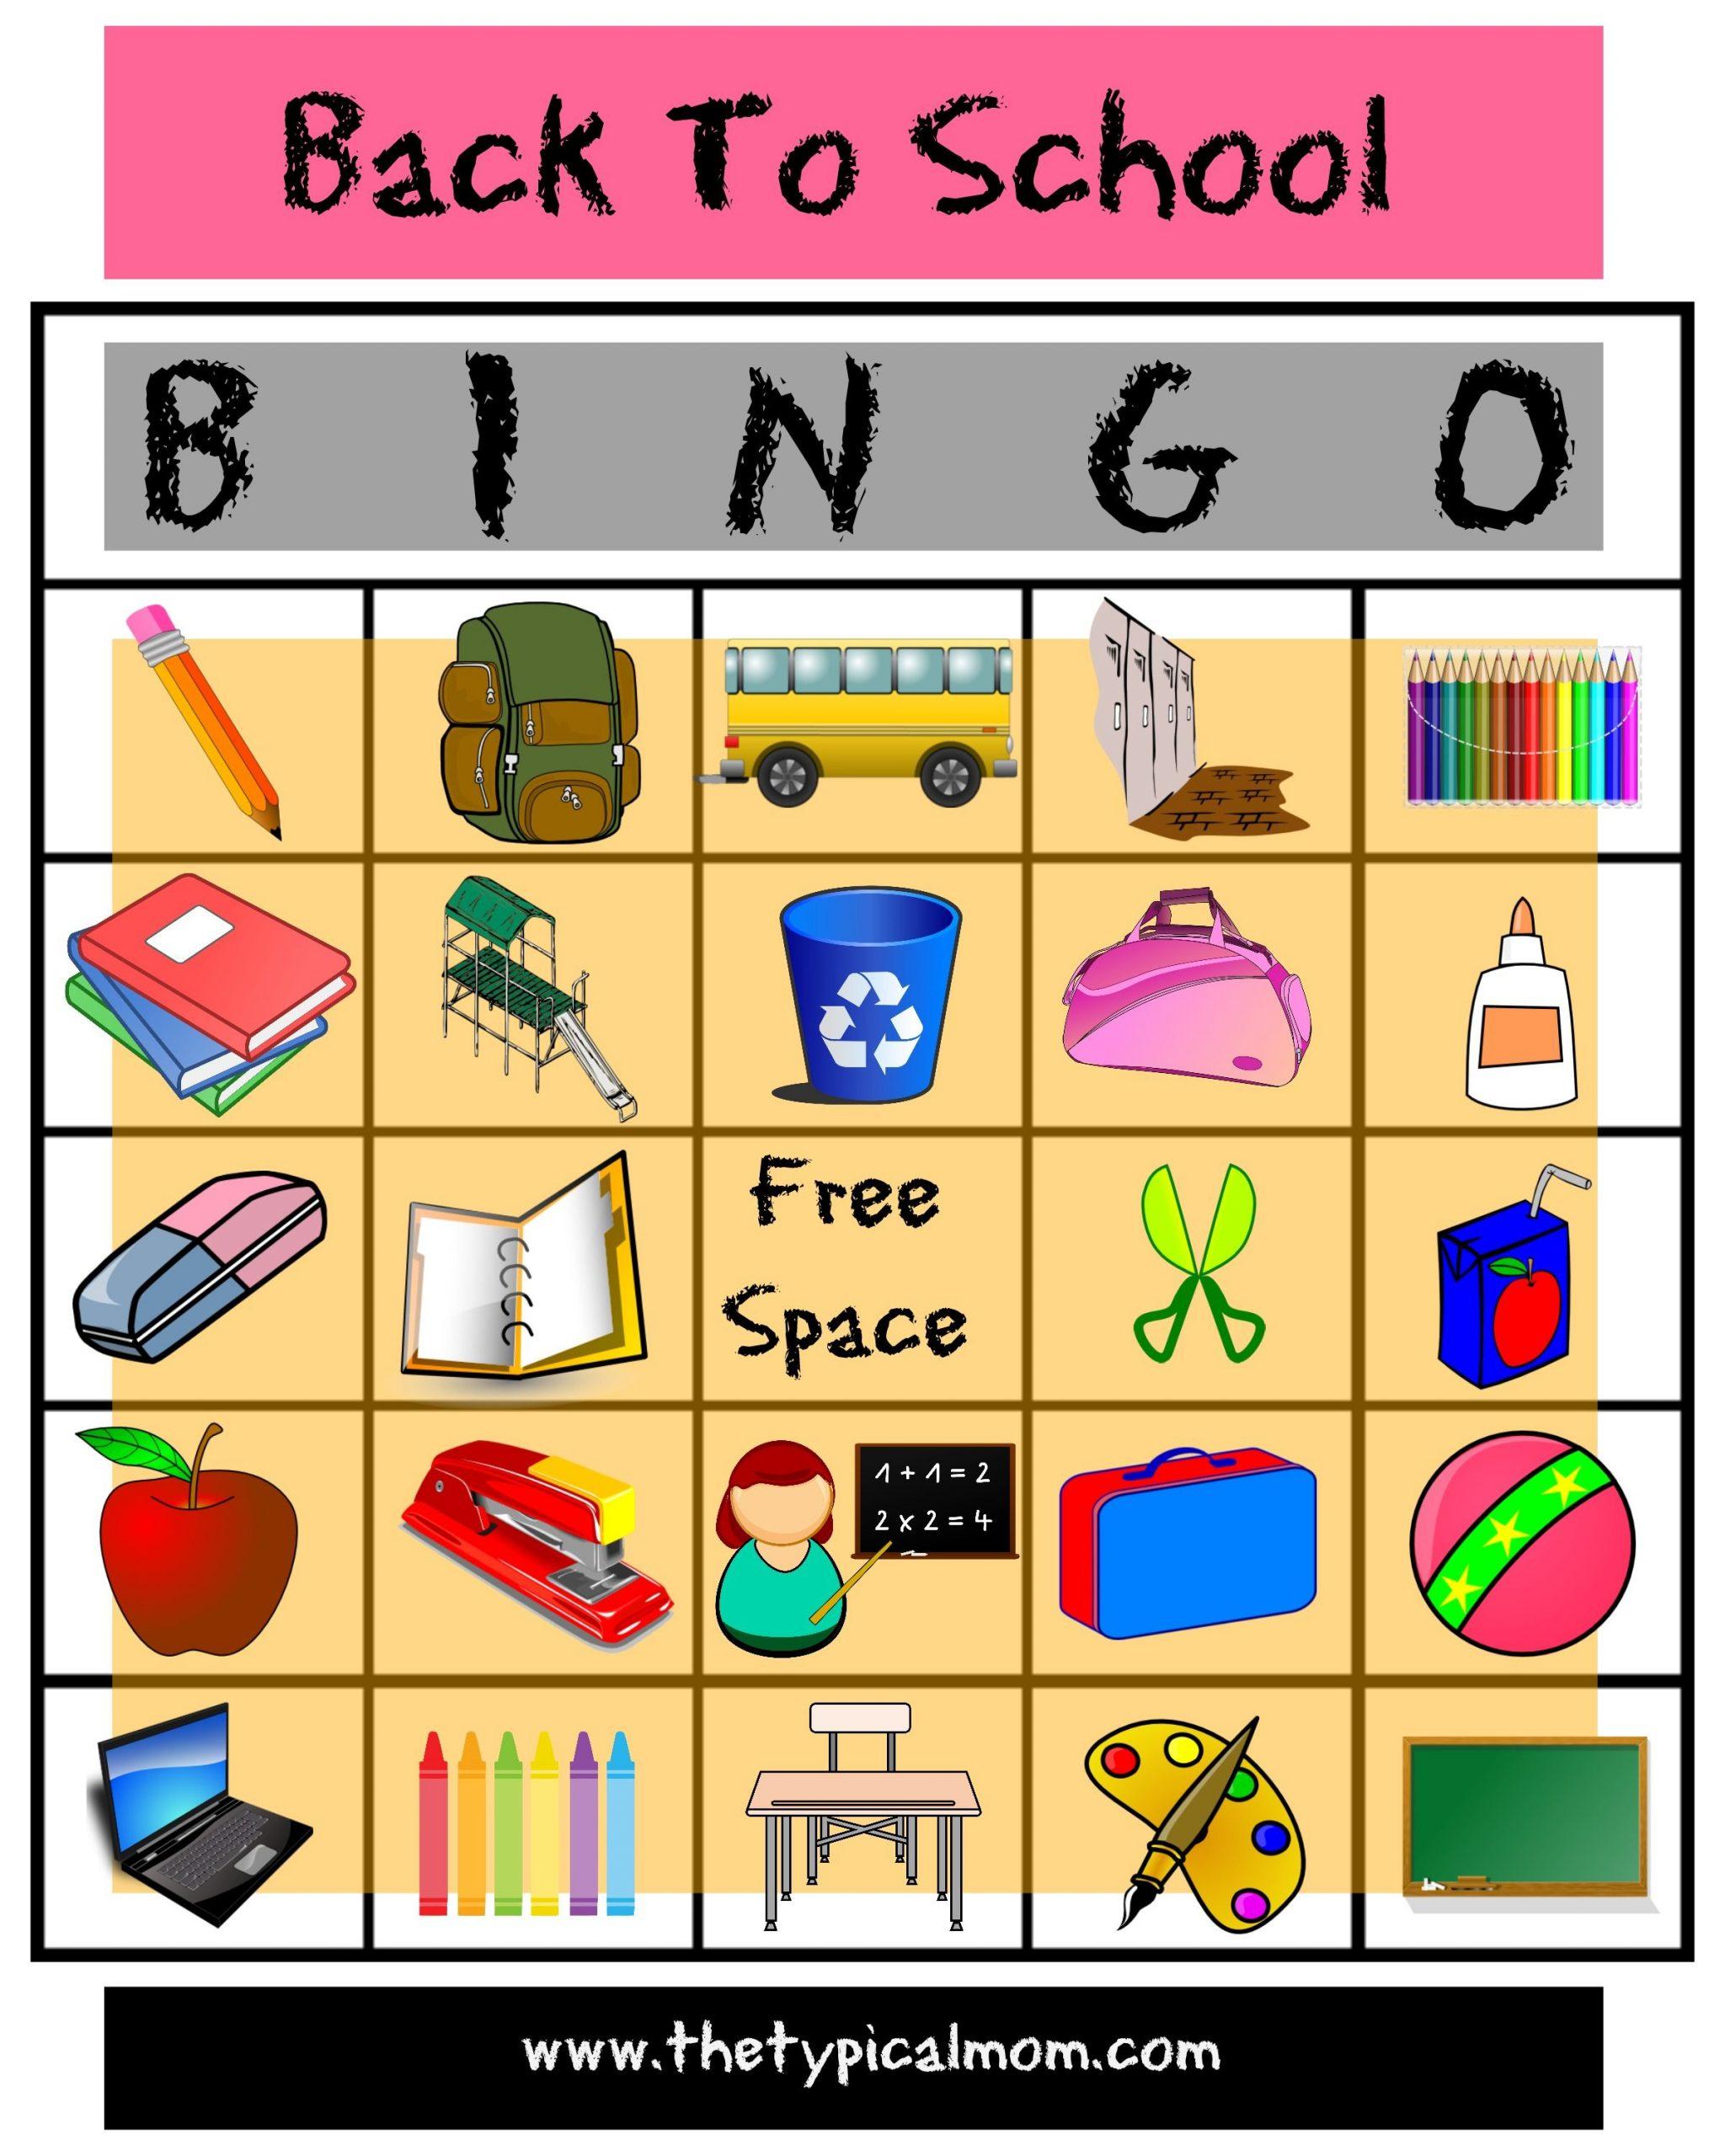 Back To School Bingo | Printable Activities For Kids, Back